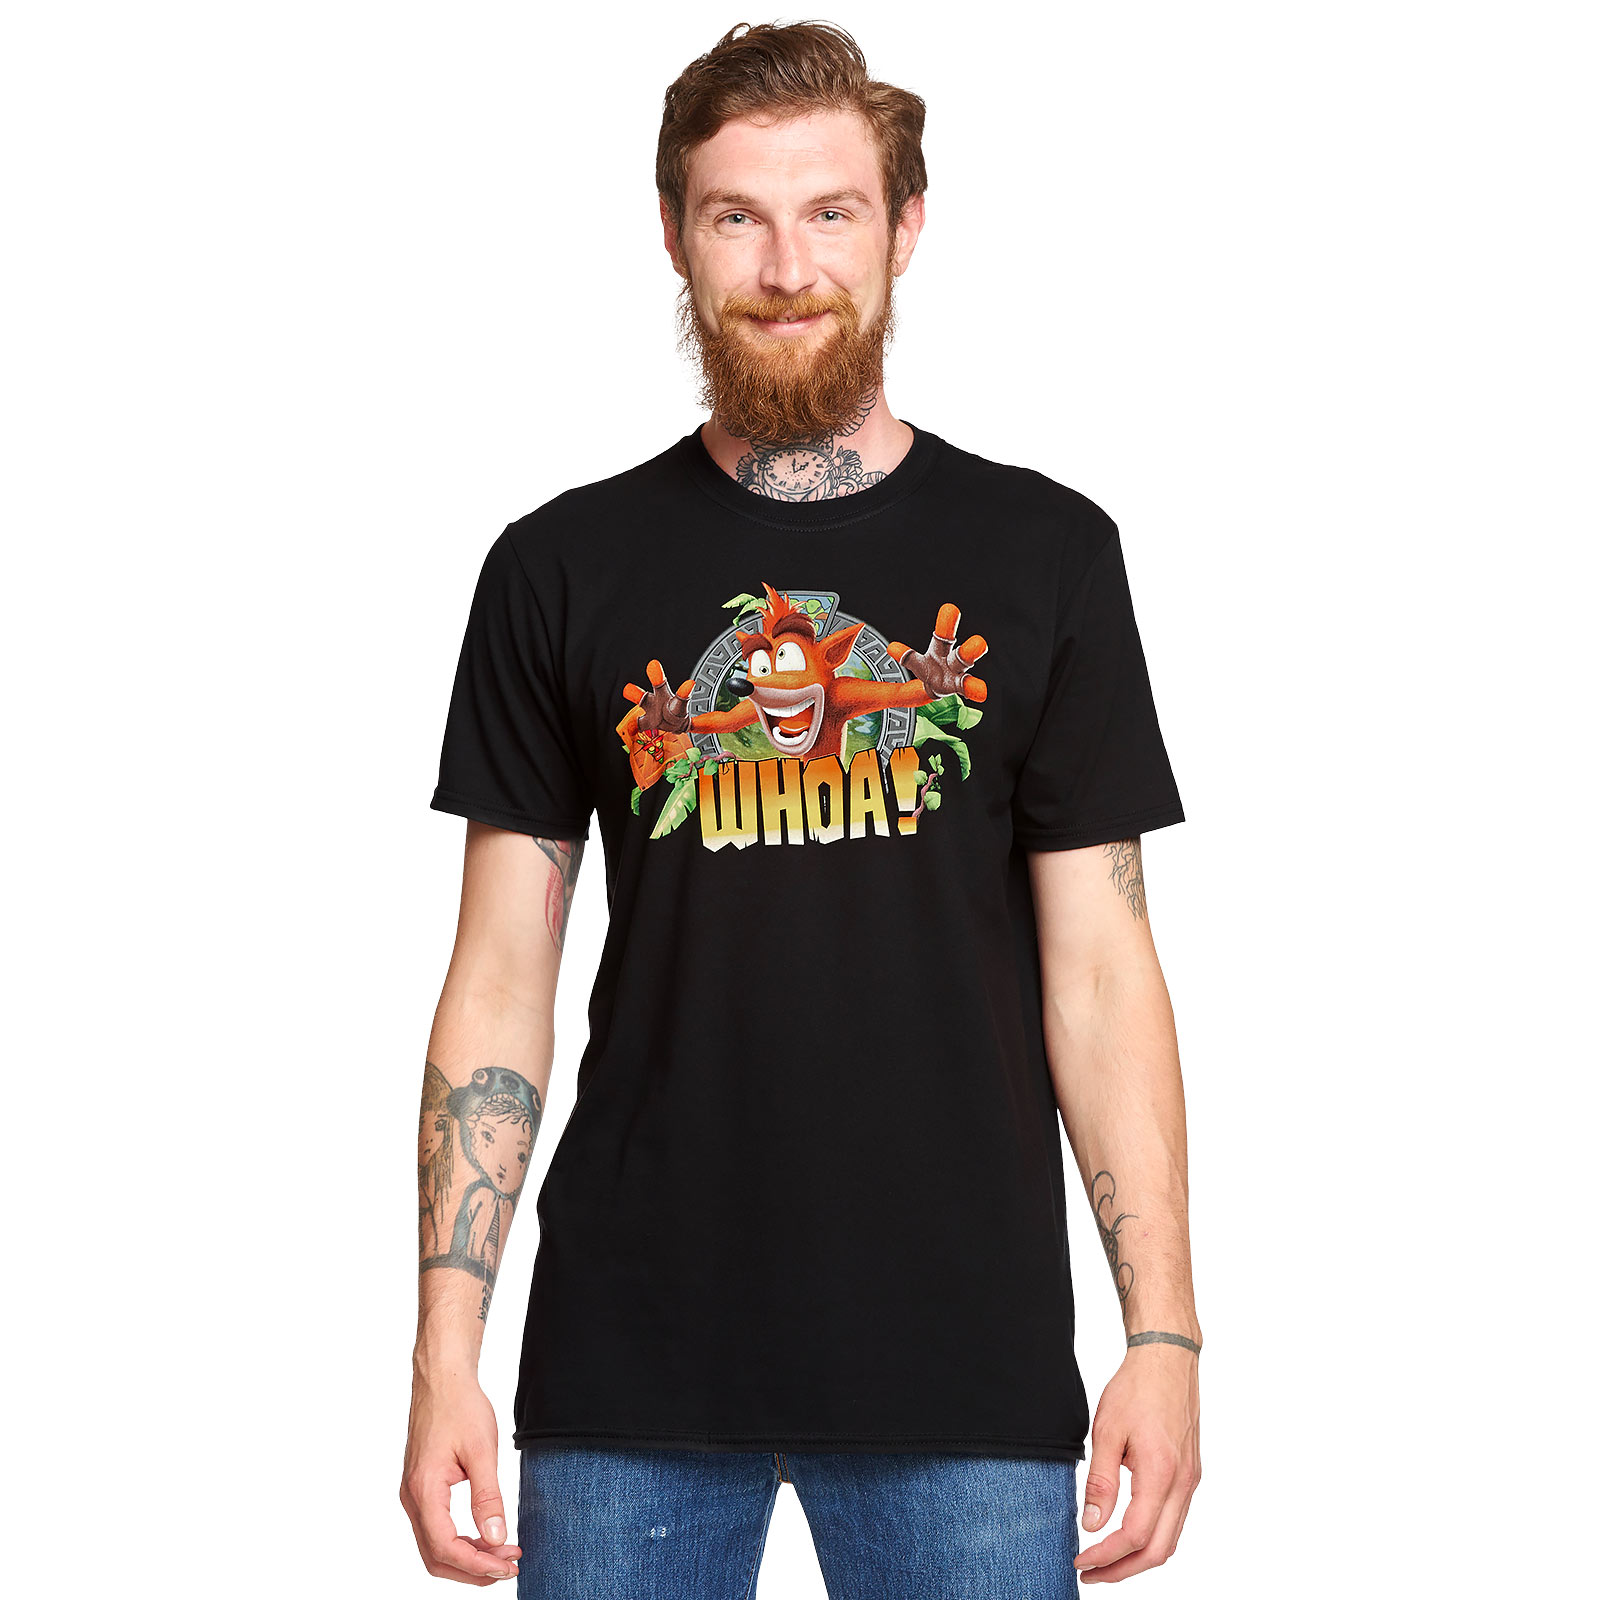 Crash Bandicoot - Whoa T-Shirt schwarz